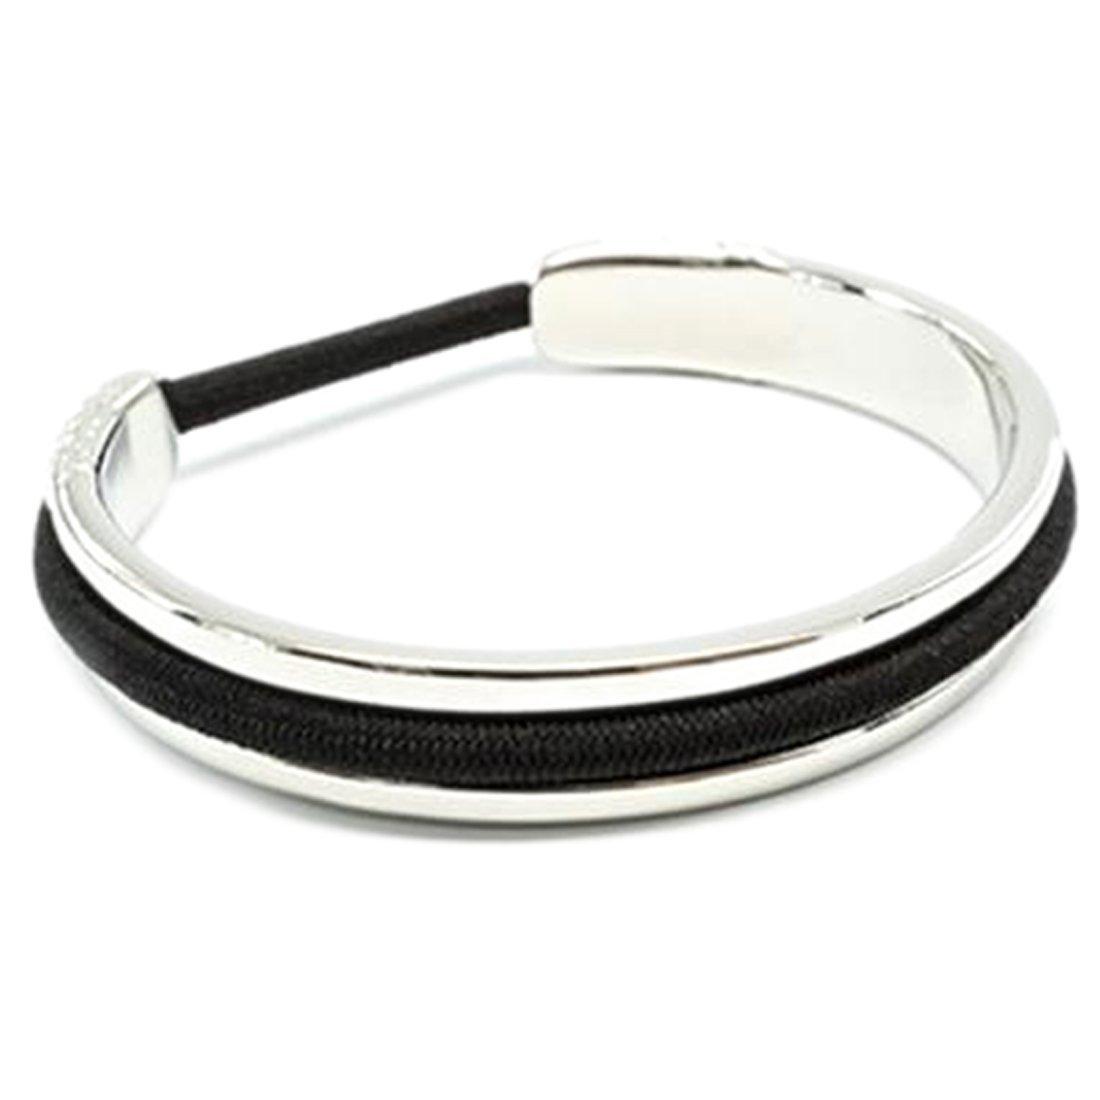 Amazon.com  Free Ship Deal Hair Elastic Holder Bangle Bracelet ... 9e4012ca78b